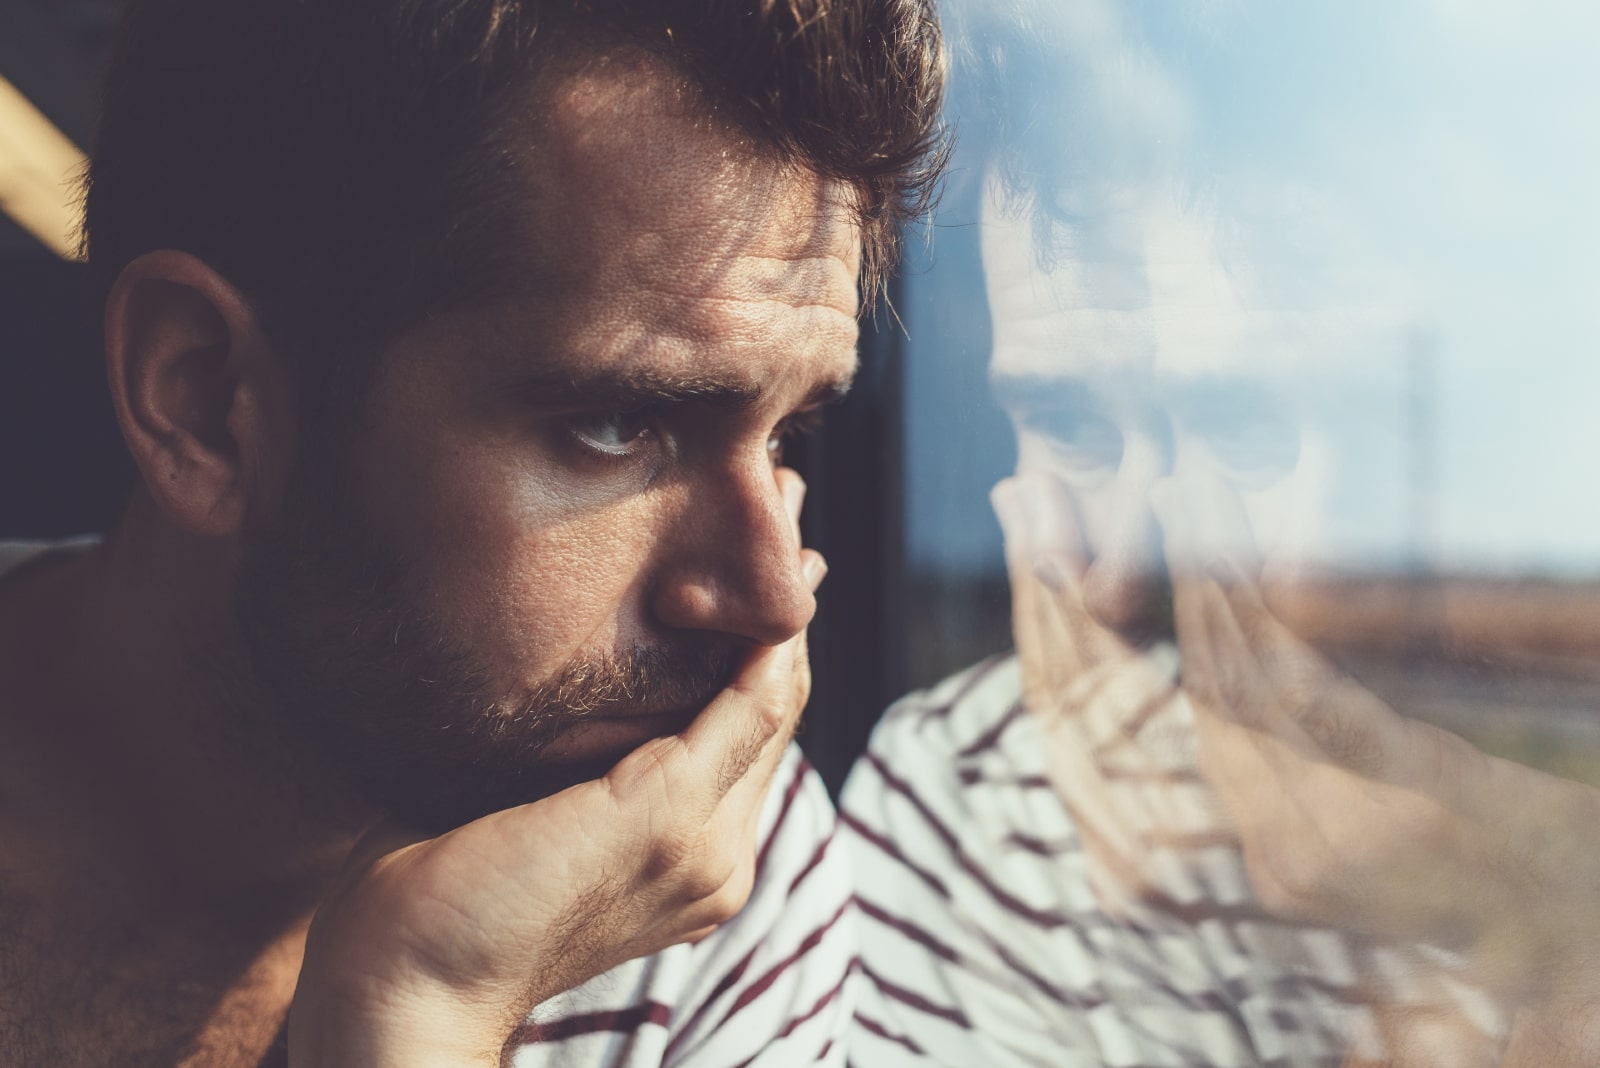 pensive man in striped shirt looking through window